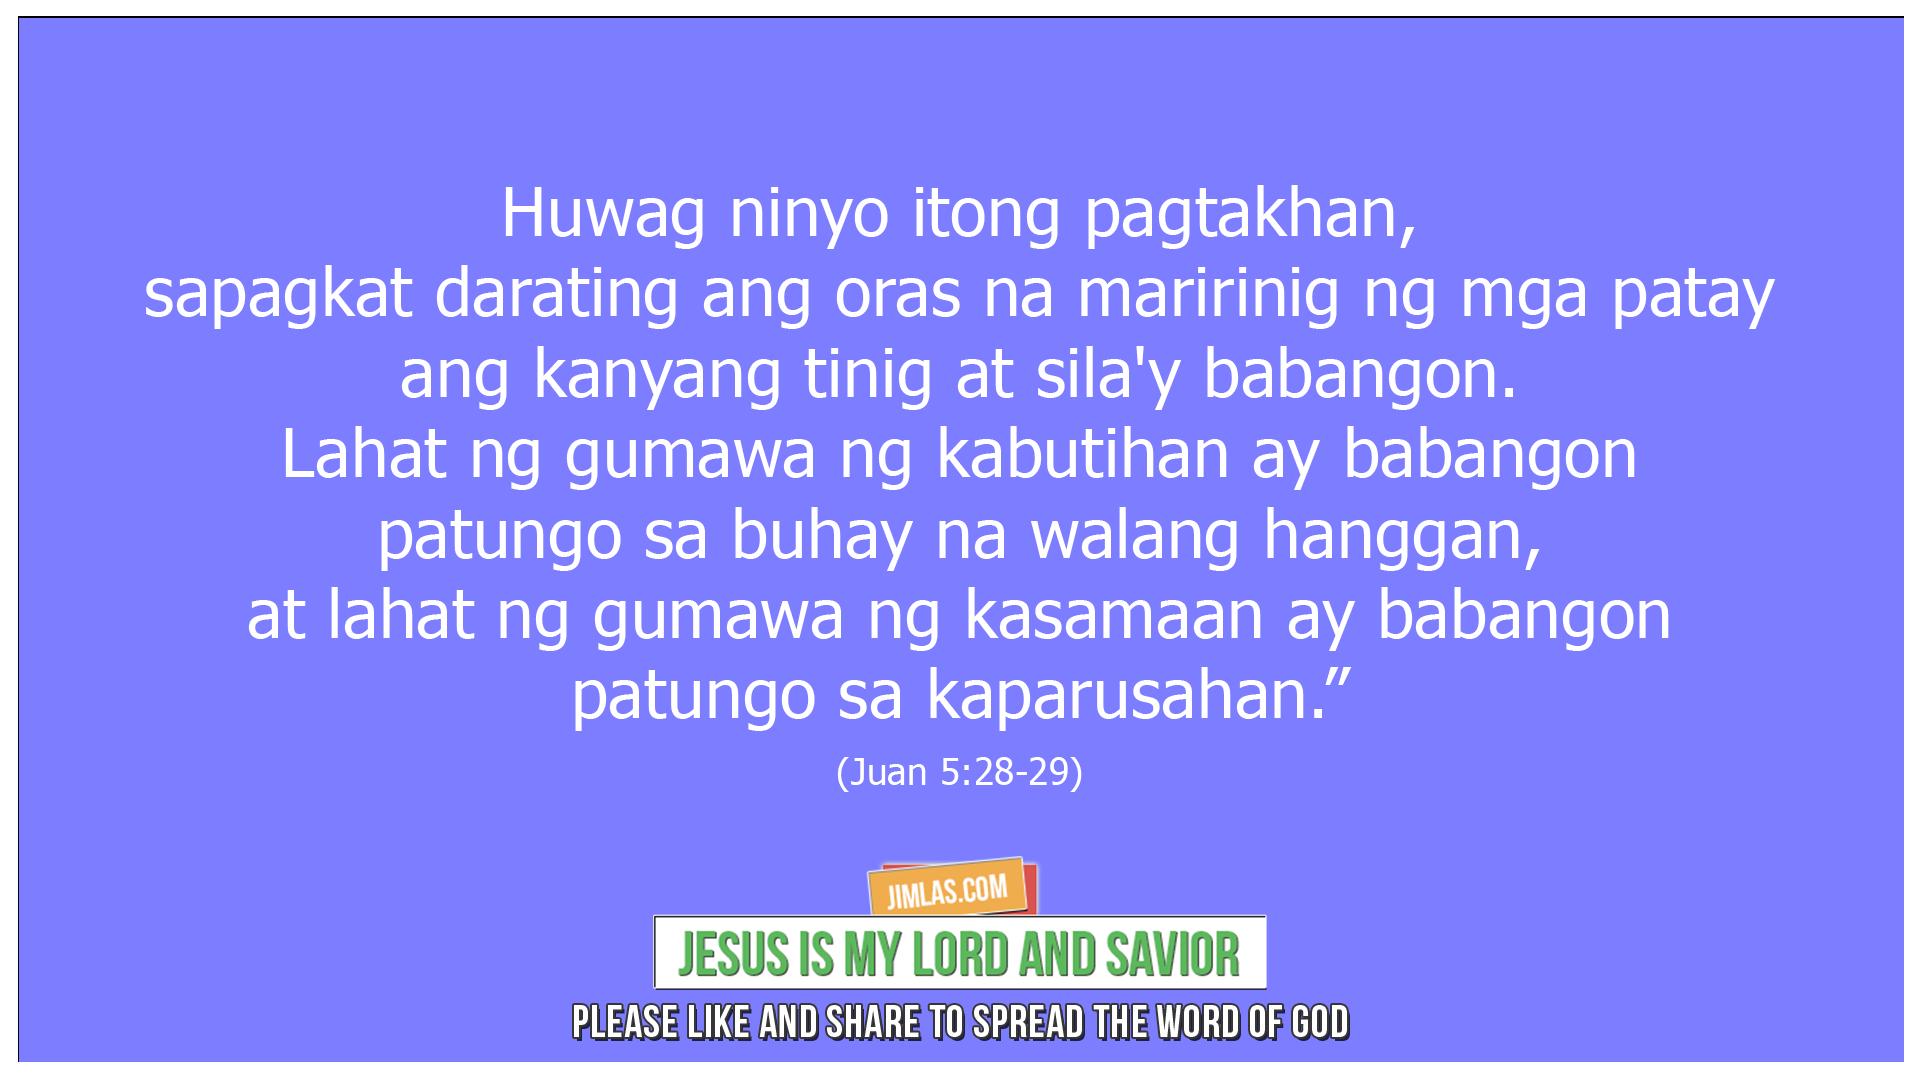 Juan 5 28-29, Juan 5:28-29